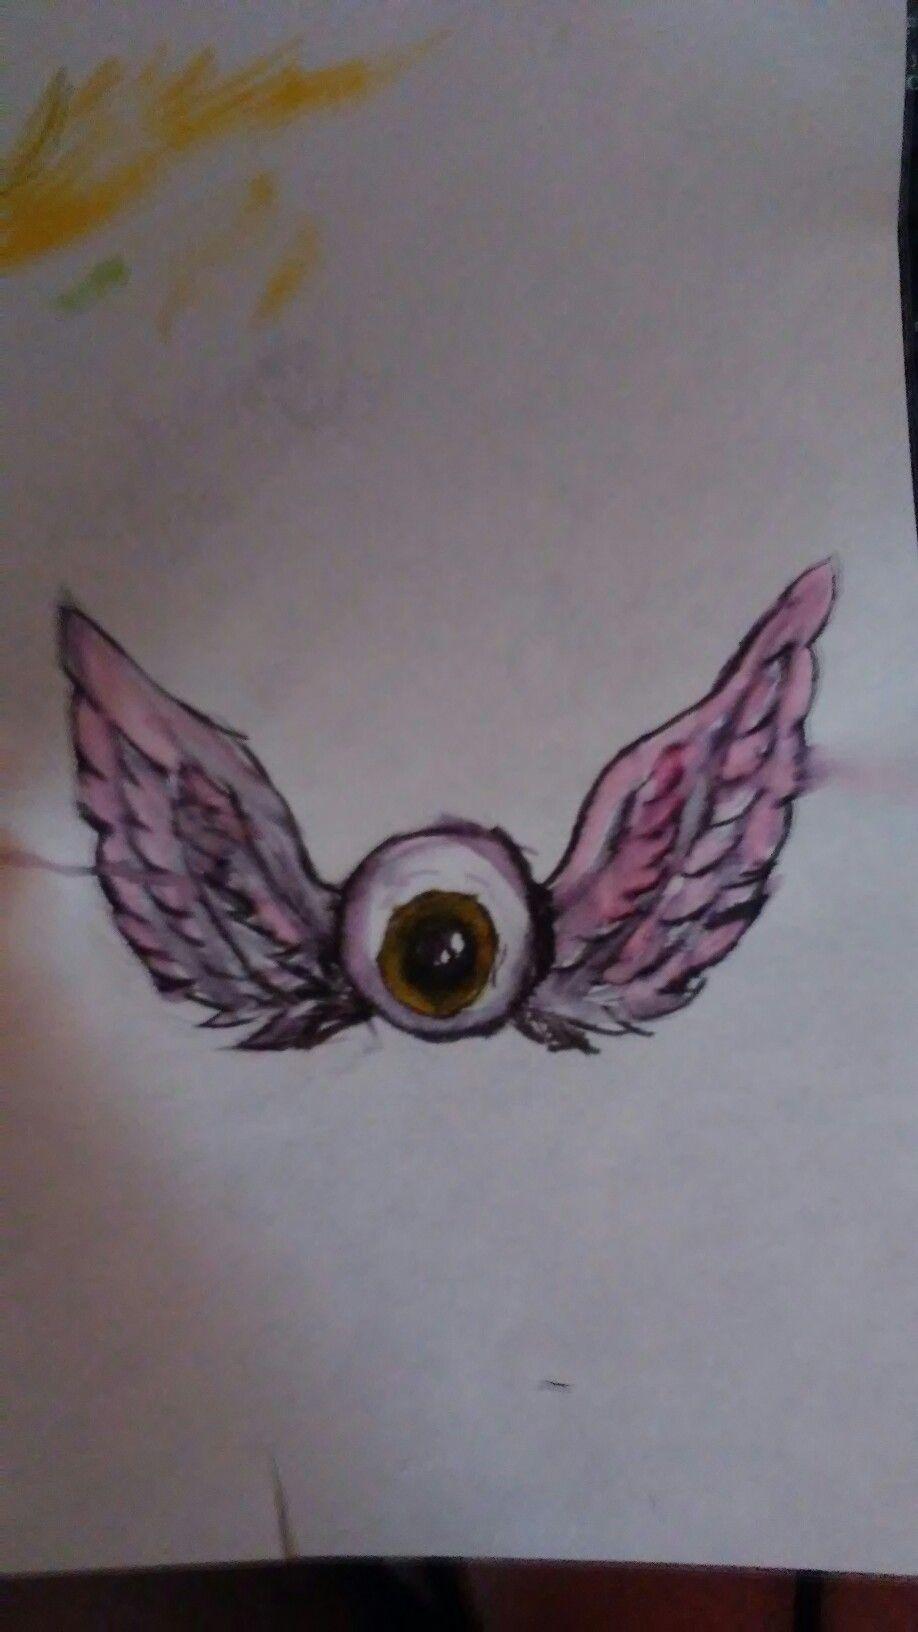 Eyeball With Wings Tattoo : eyeball, wings, tattoo, Eyeball, Animal, Tattoo,, Tattoo, Inspiration,, Wings